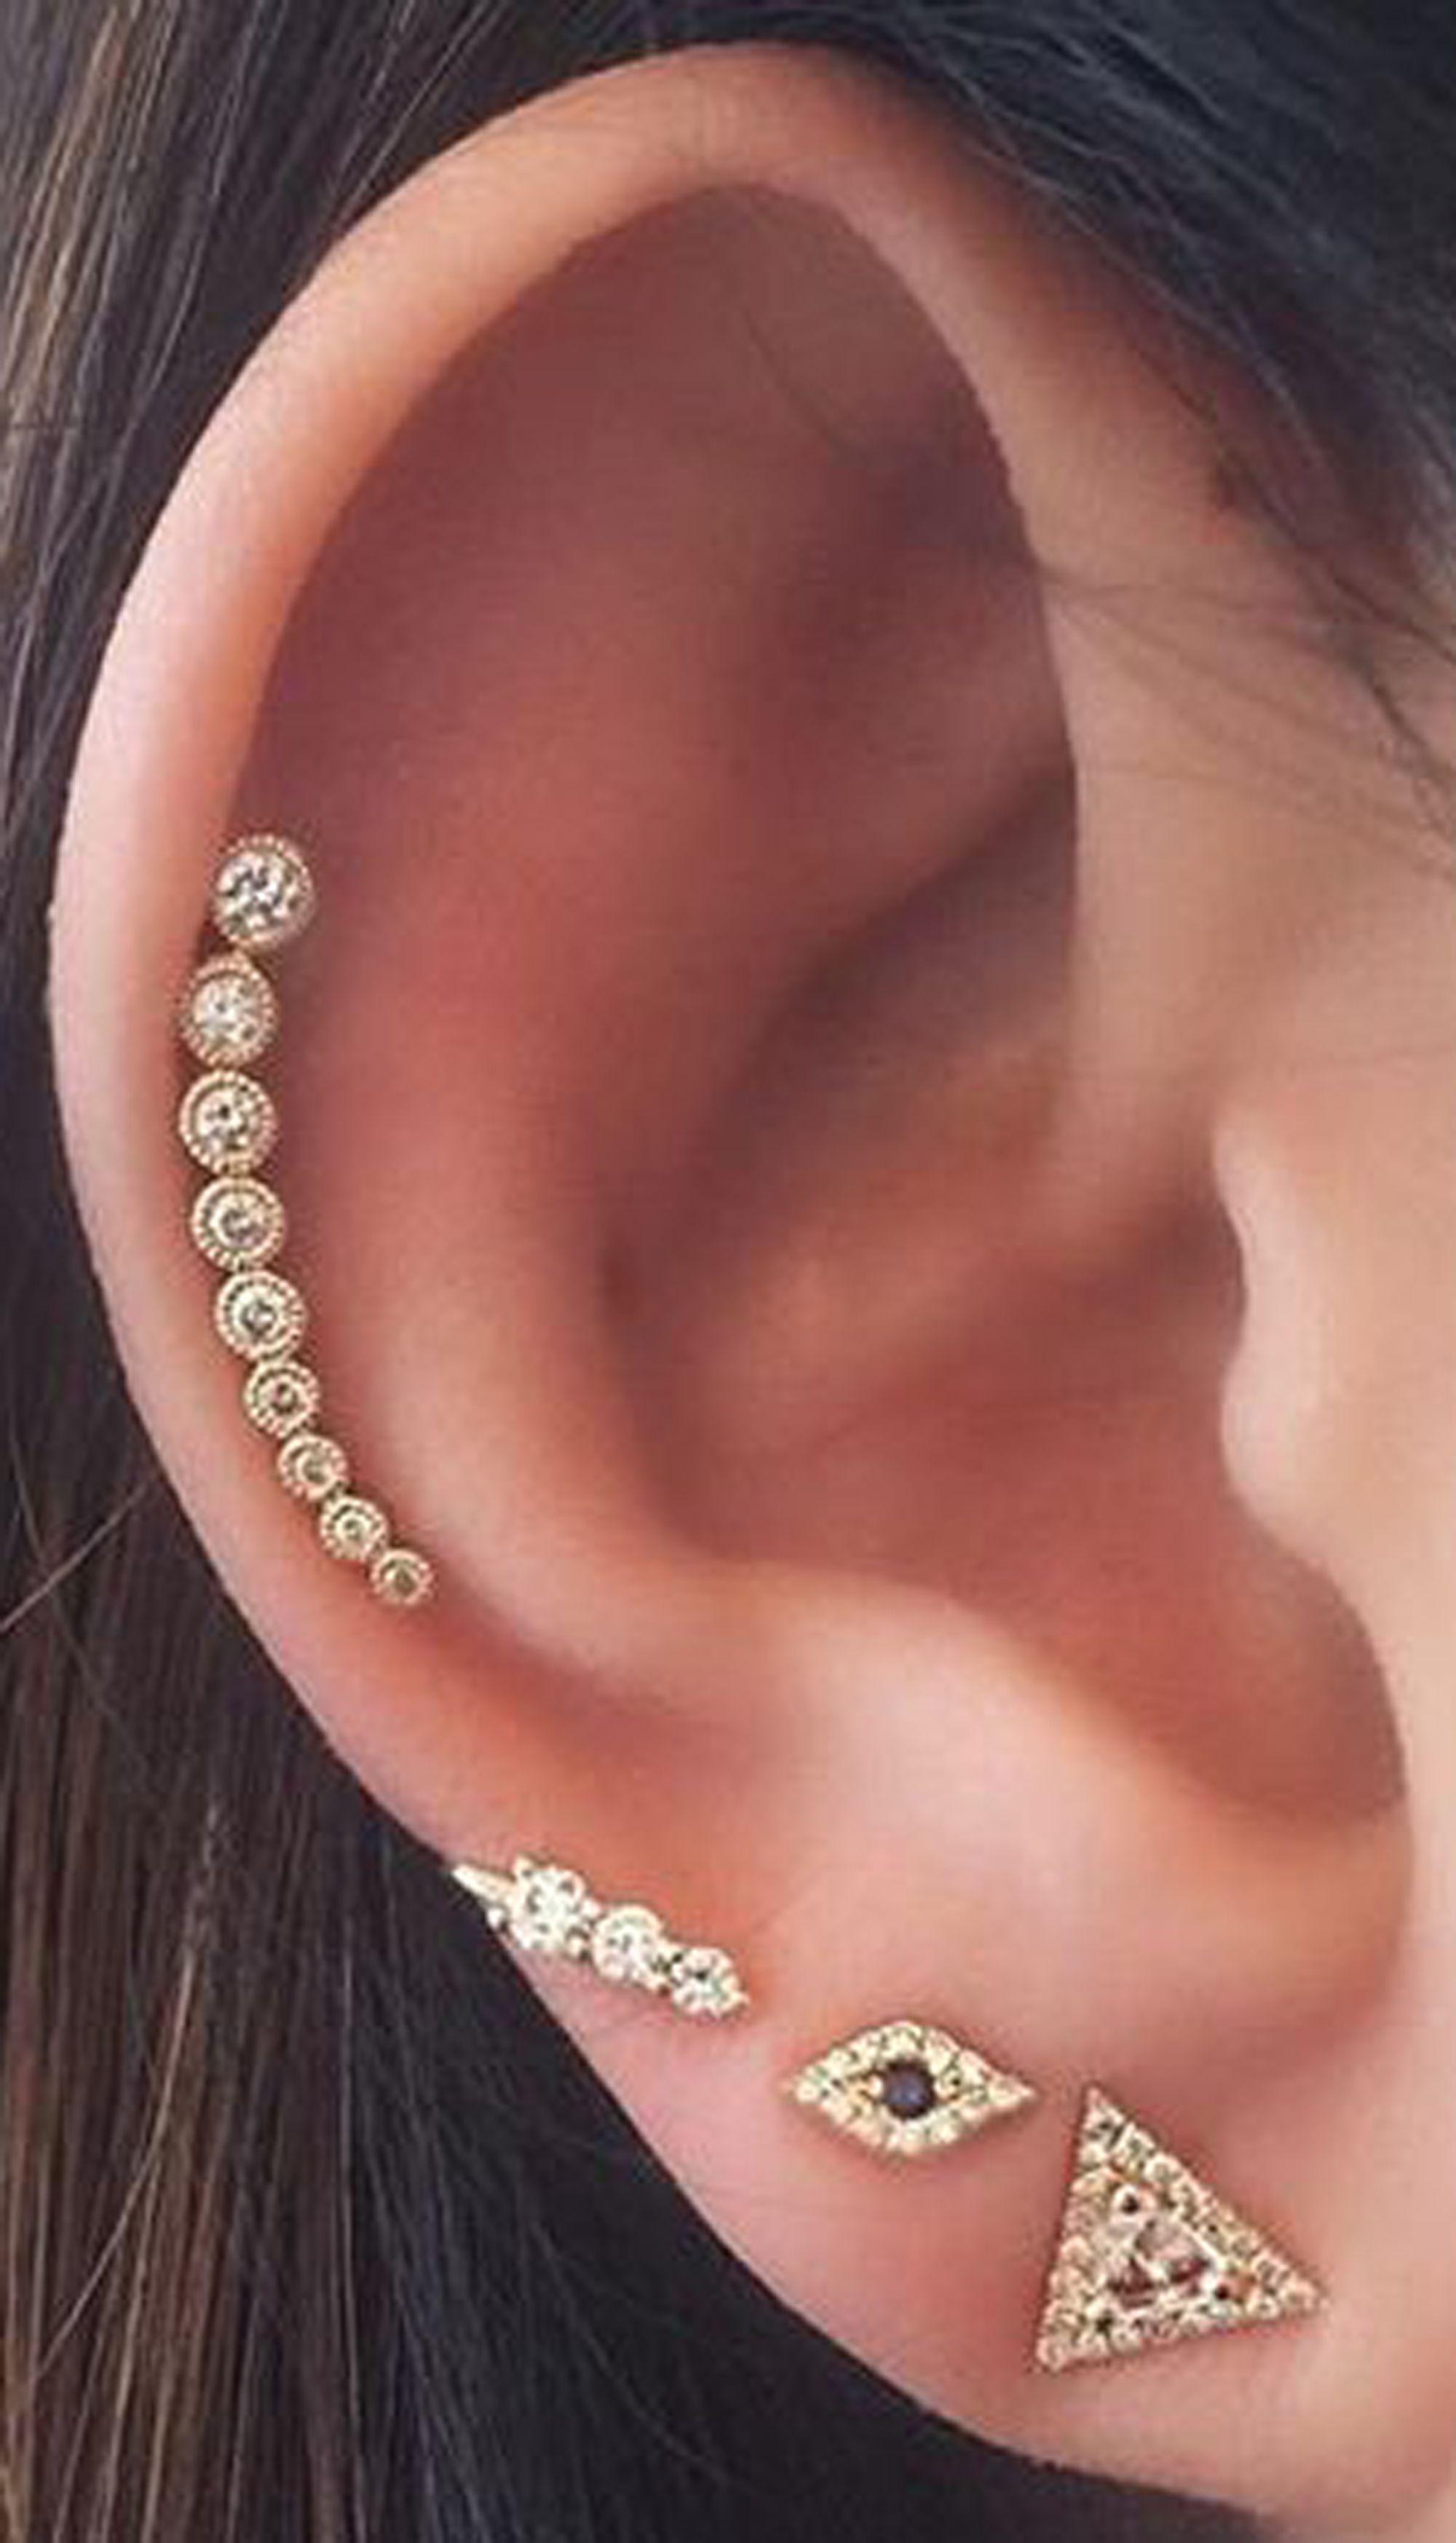 53c944b8d cute cartilage simple gold ear piercing ideas - www.MyBodiArt.com ...